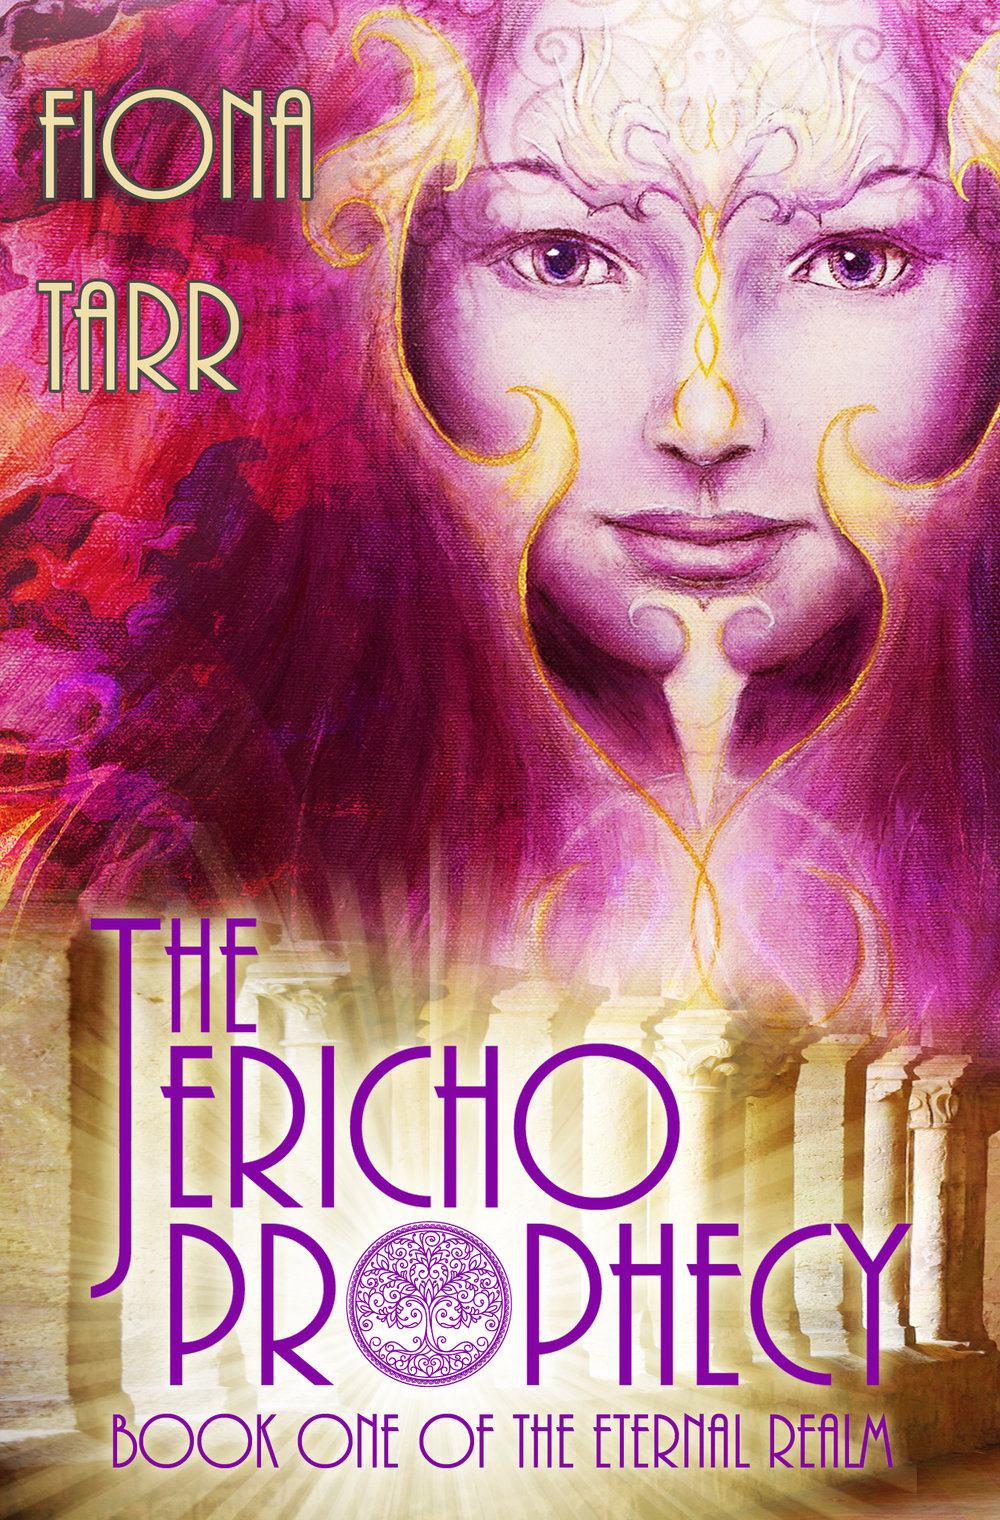 Jericho Cover - 2HC.jpg